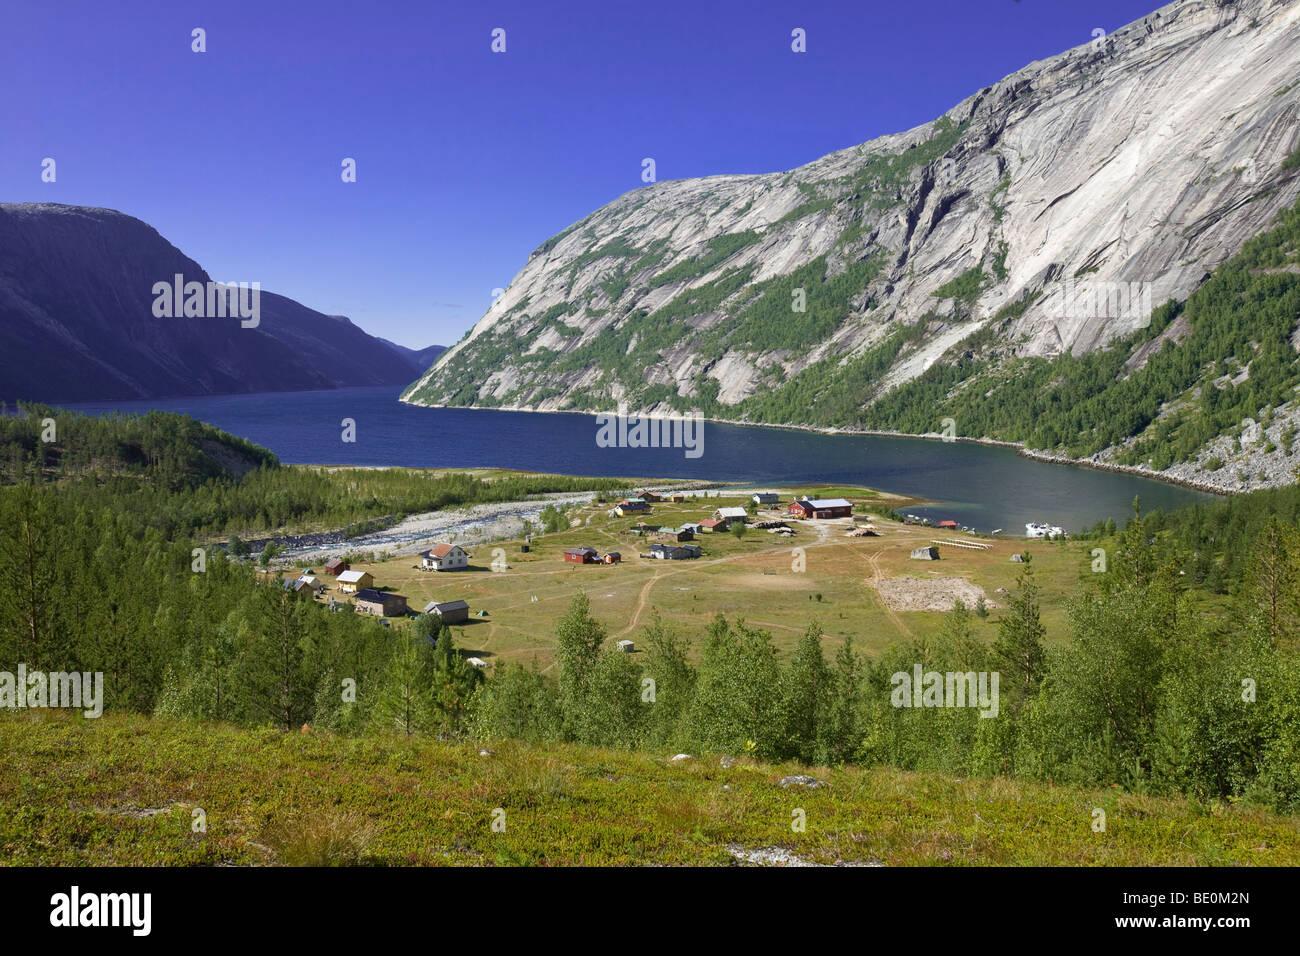 Sami village Hellmobotn a Hellmofjorden, Norvegia, Scandinavia, Europa Immagini Stock